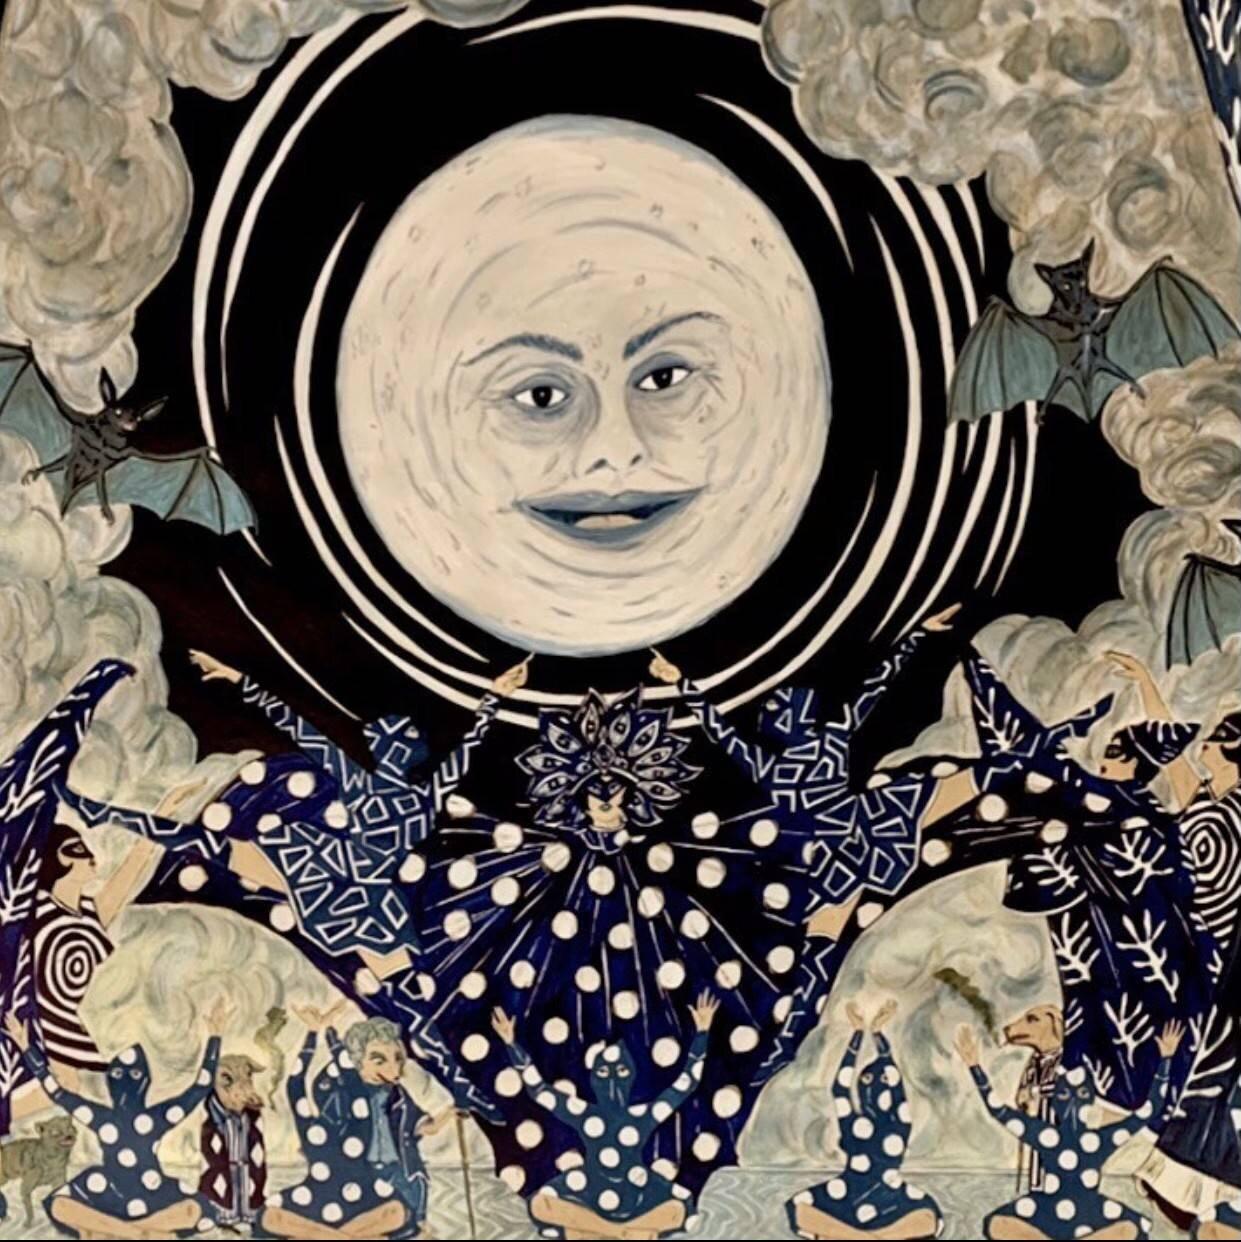 Aquarius Full Moon: Making Room For The Future